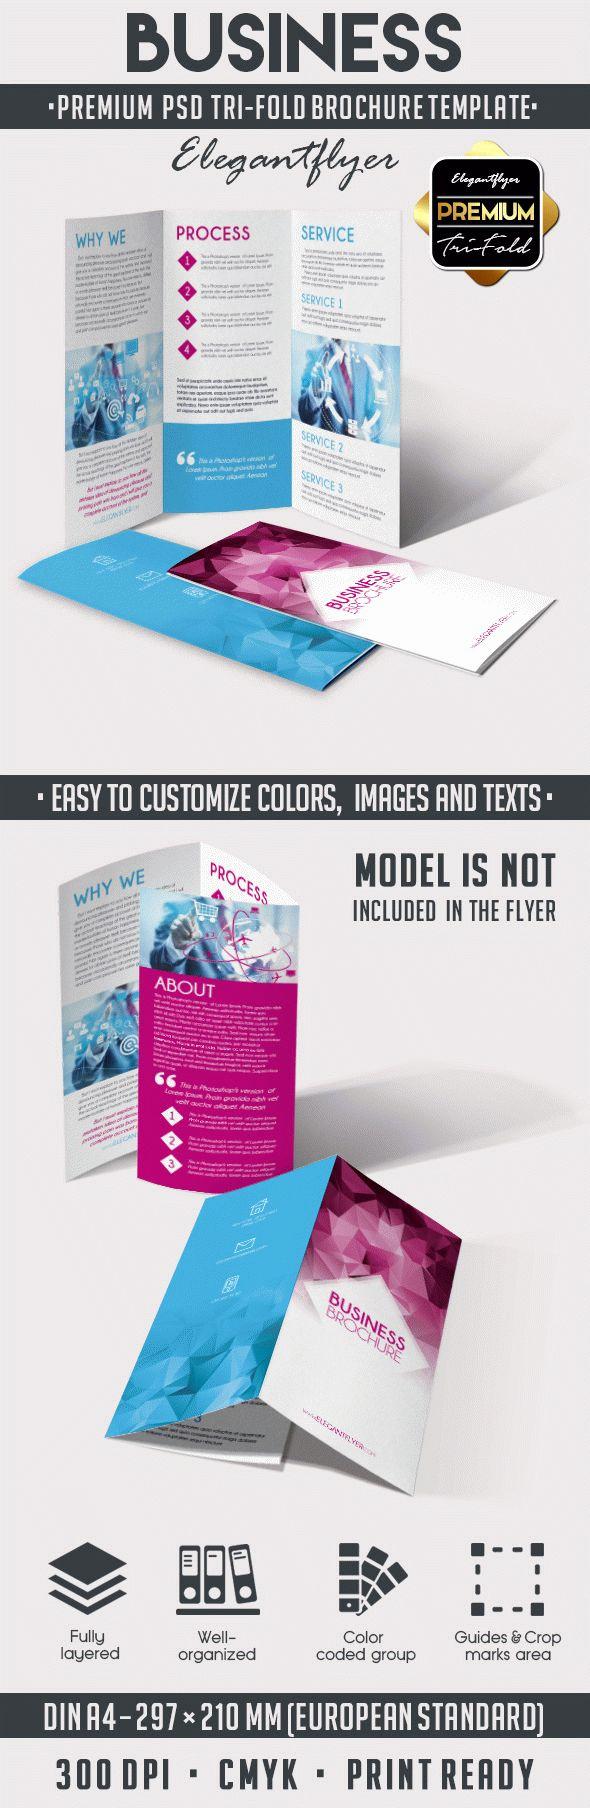 Tri Fold Brochure Template Psd Luxury Business – Tri Fold Brochure Psd Template – by Elegantflyer